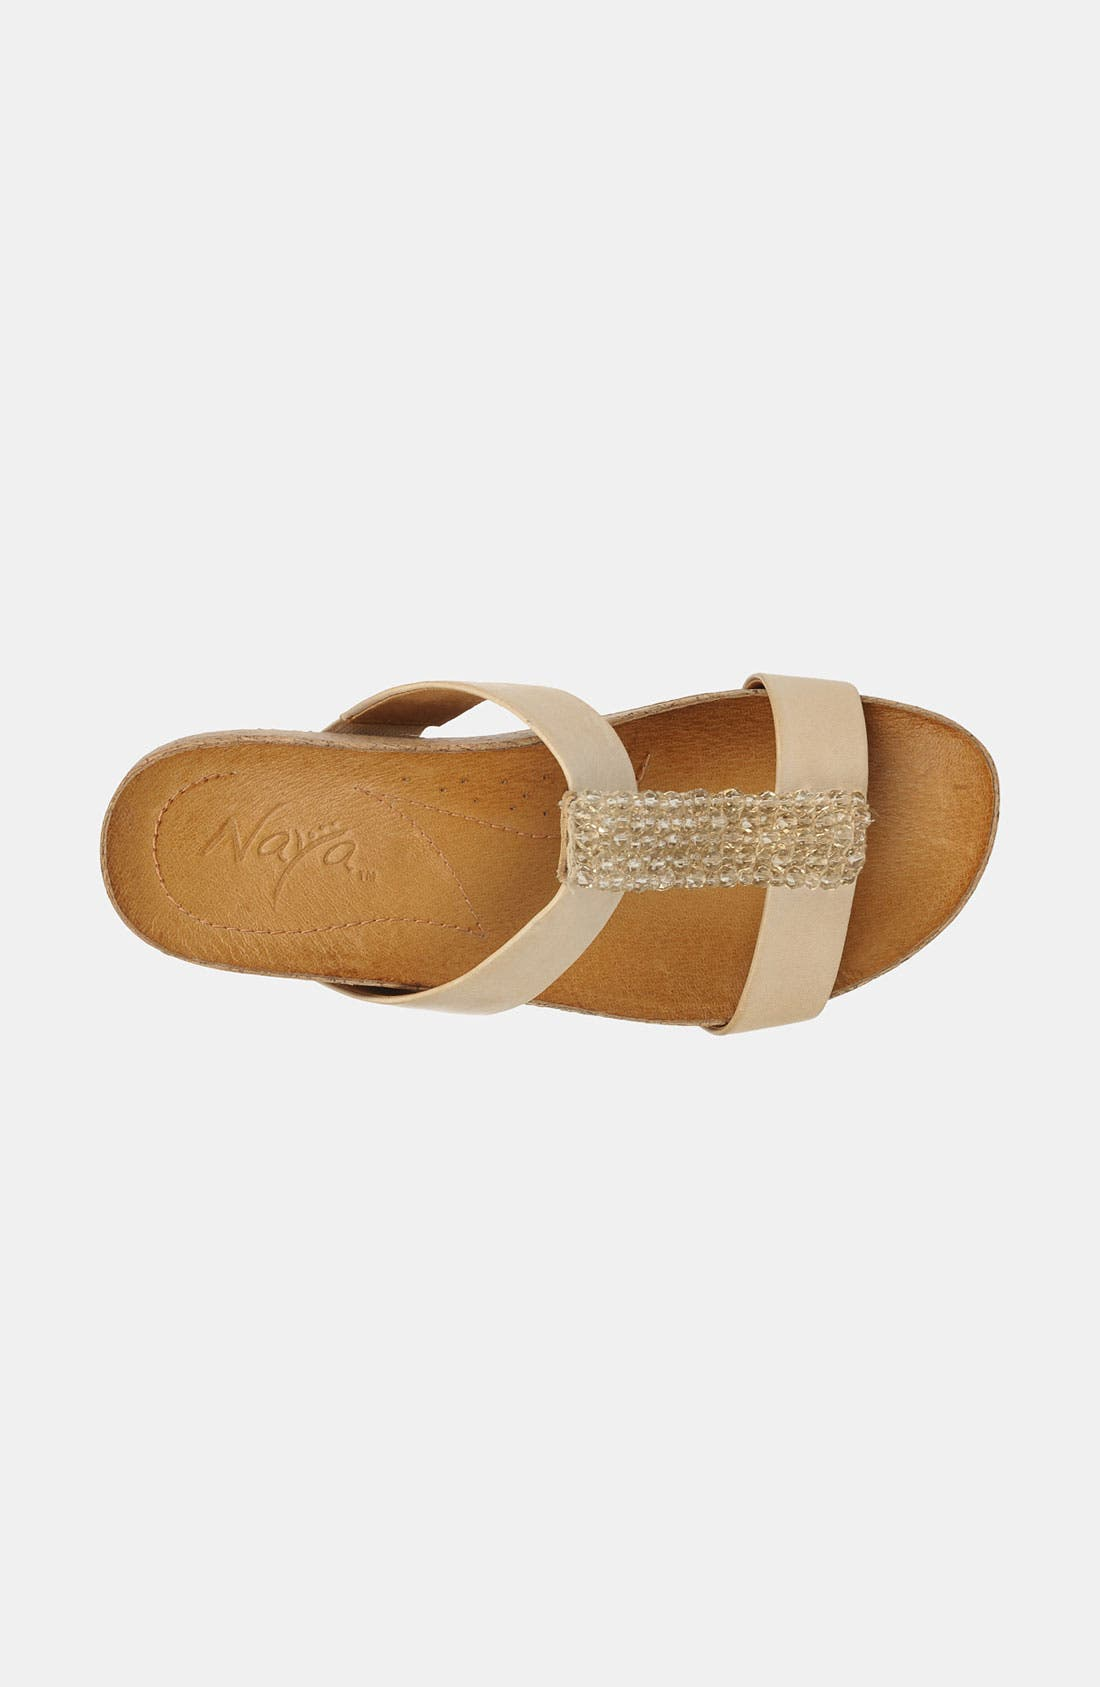 Alternate Image 3  - Naya 'Belle' Sandal